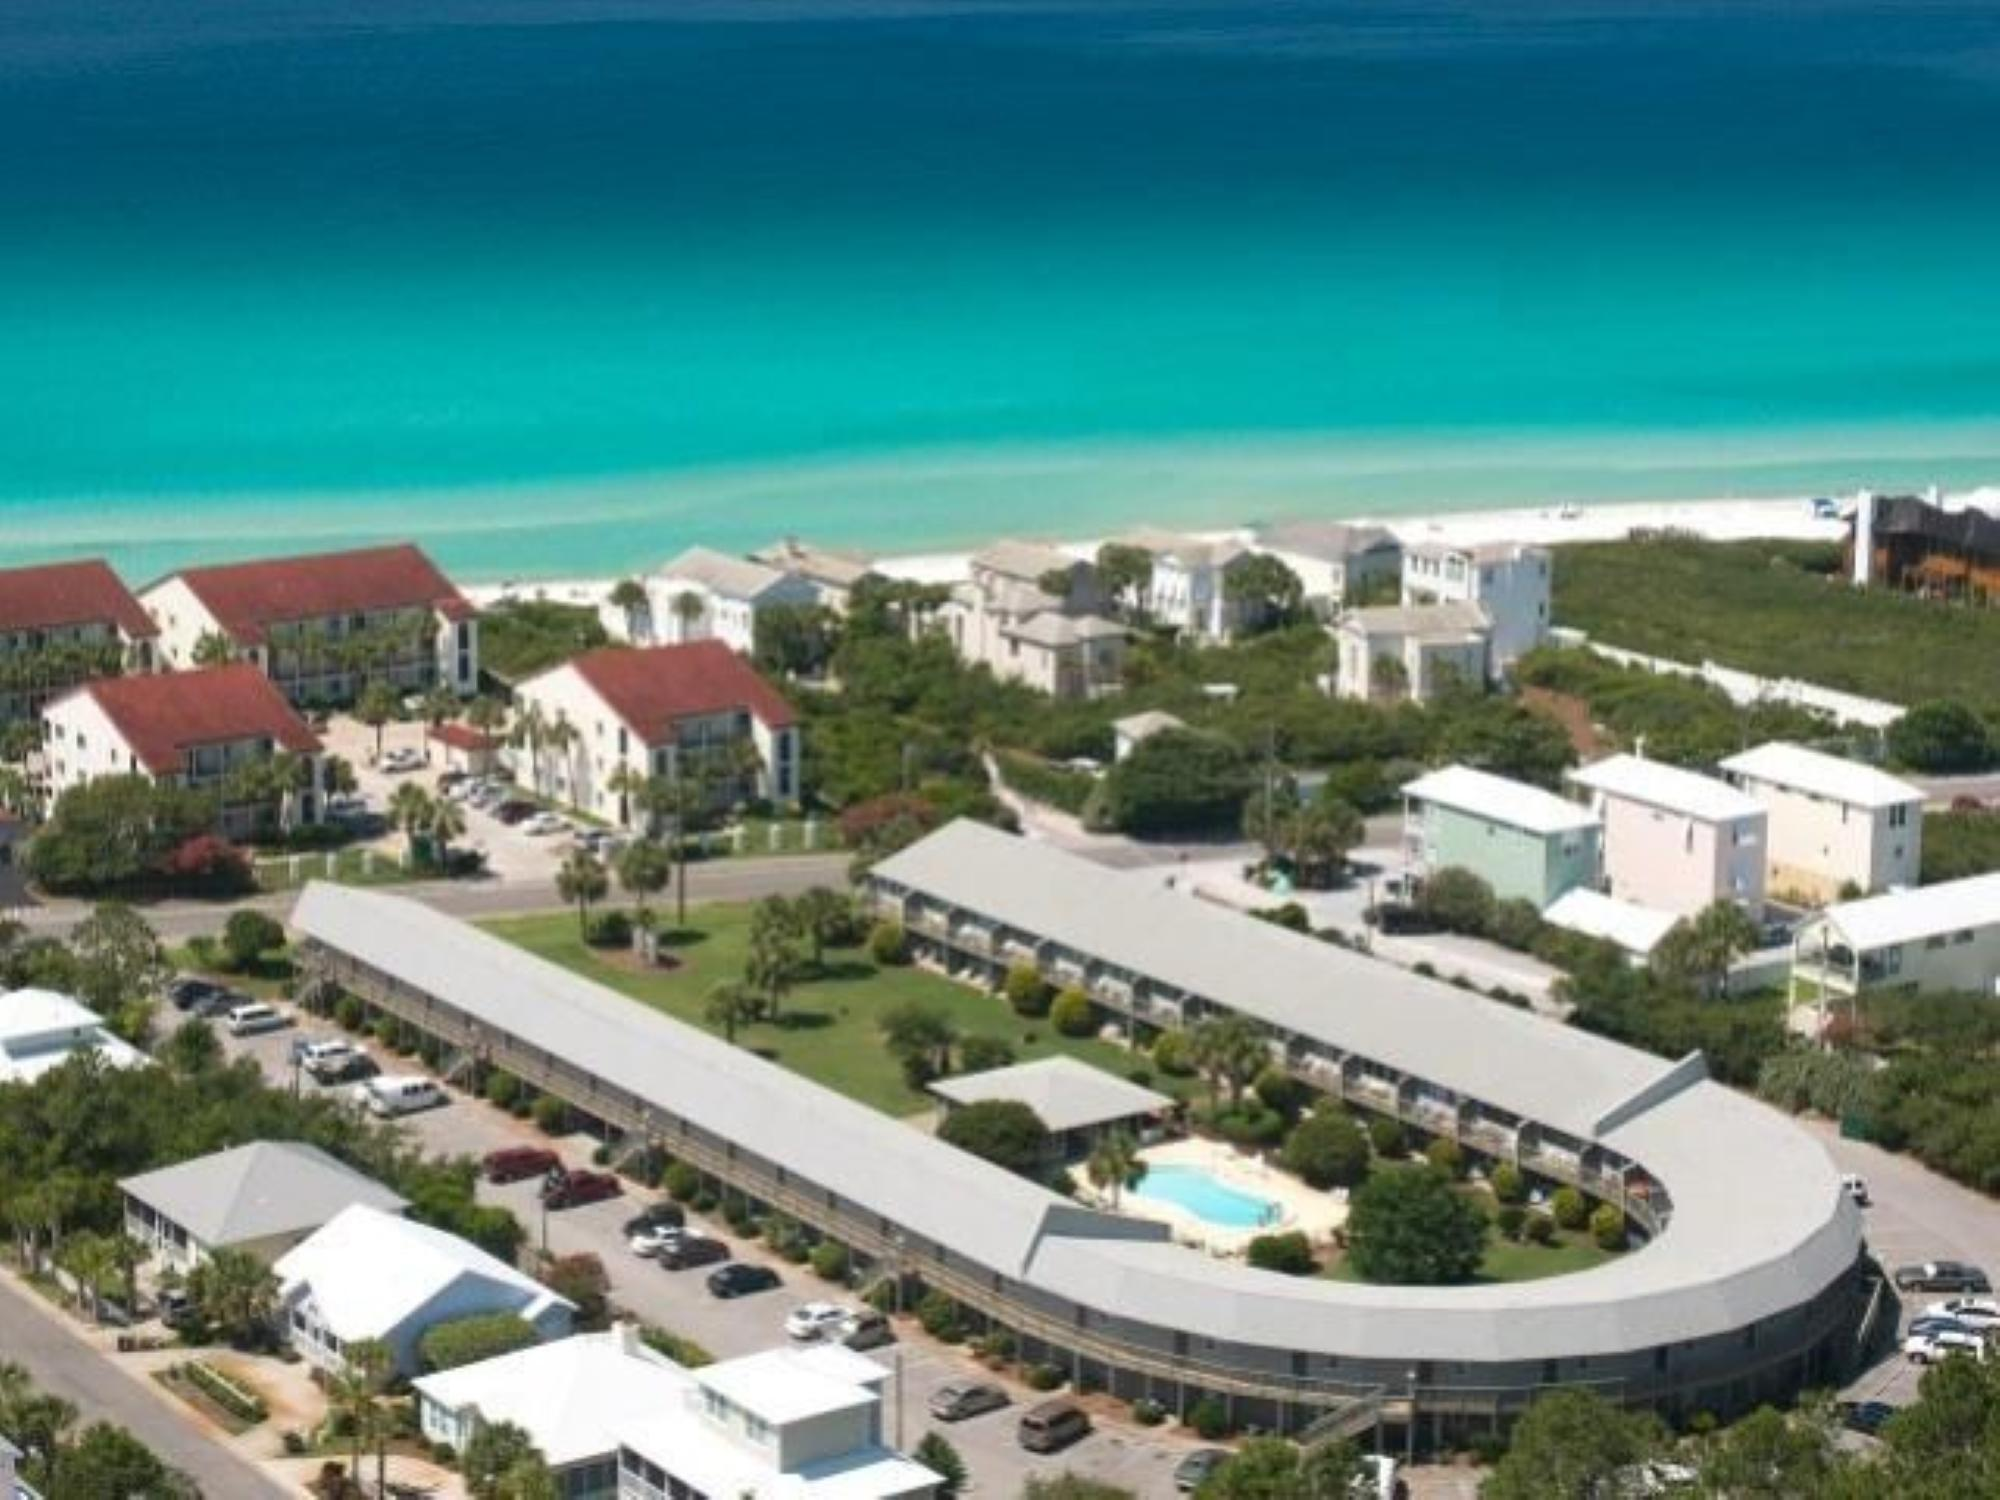 Photo of home for sale in Santa Rosa Beach FL